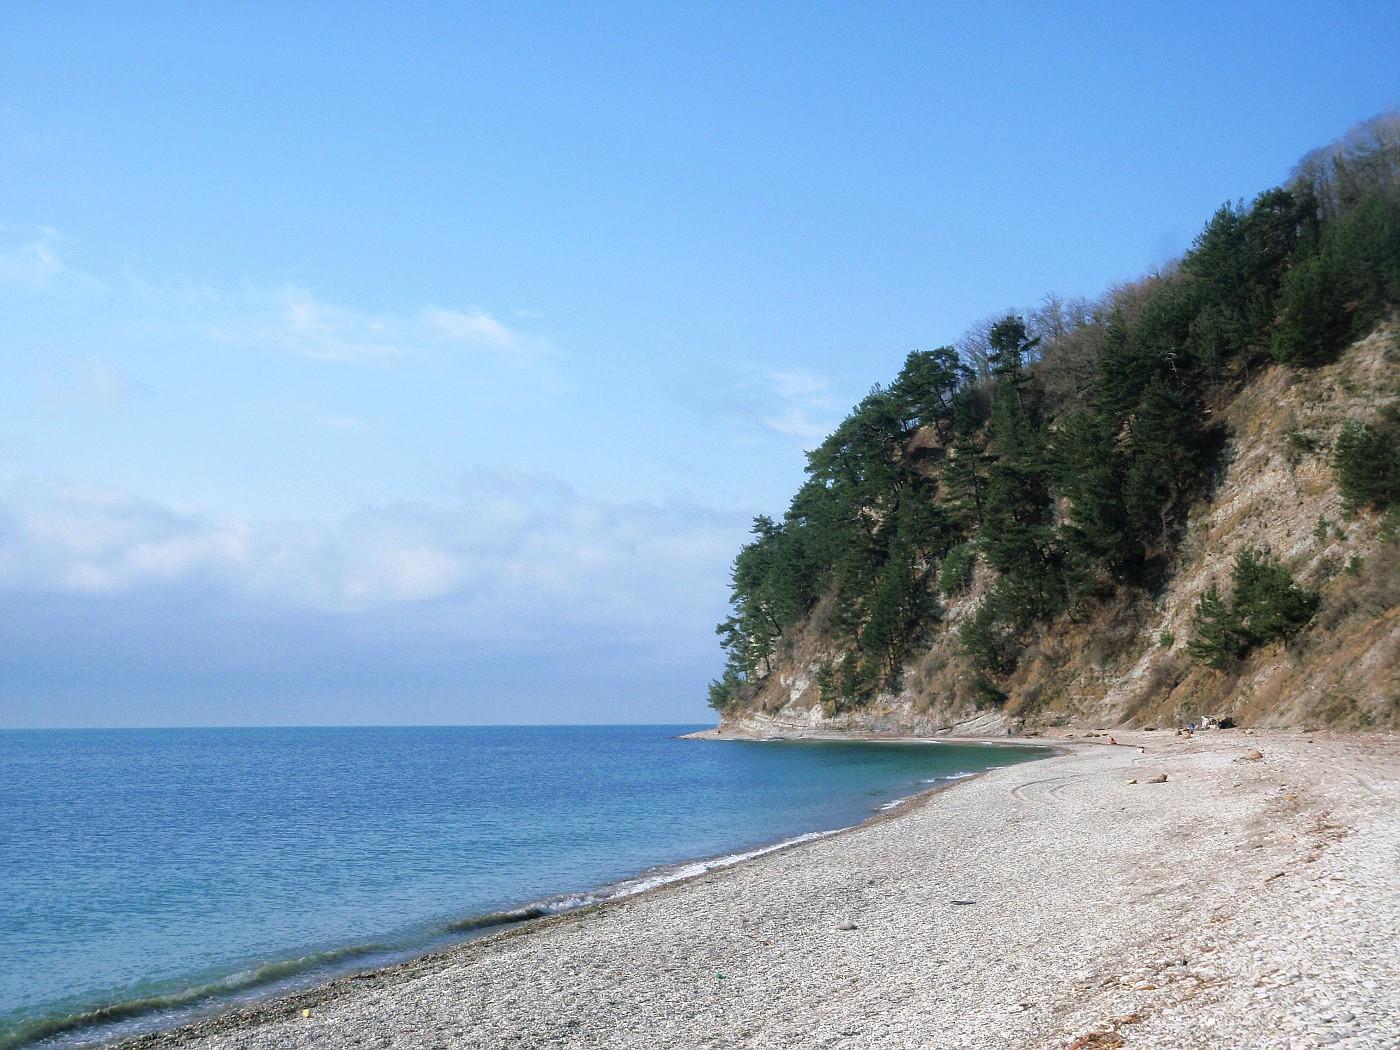 Beach of the Black Sea